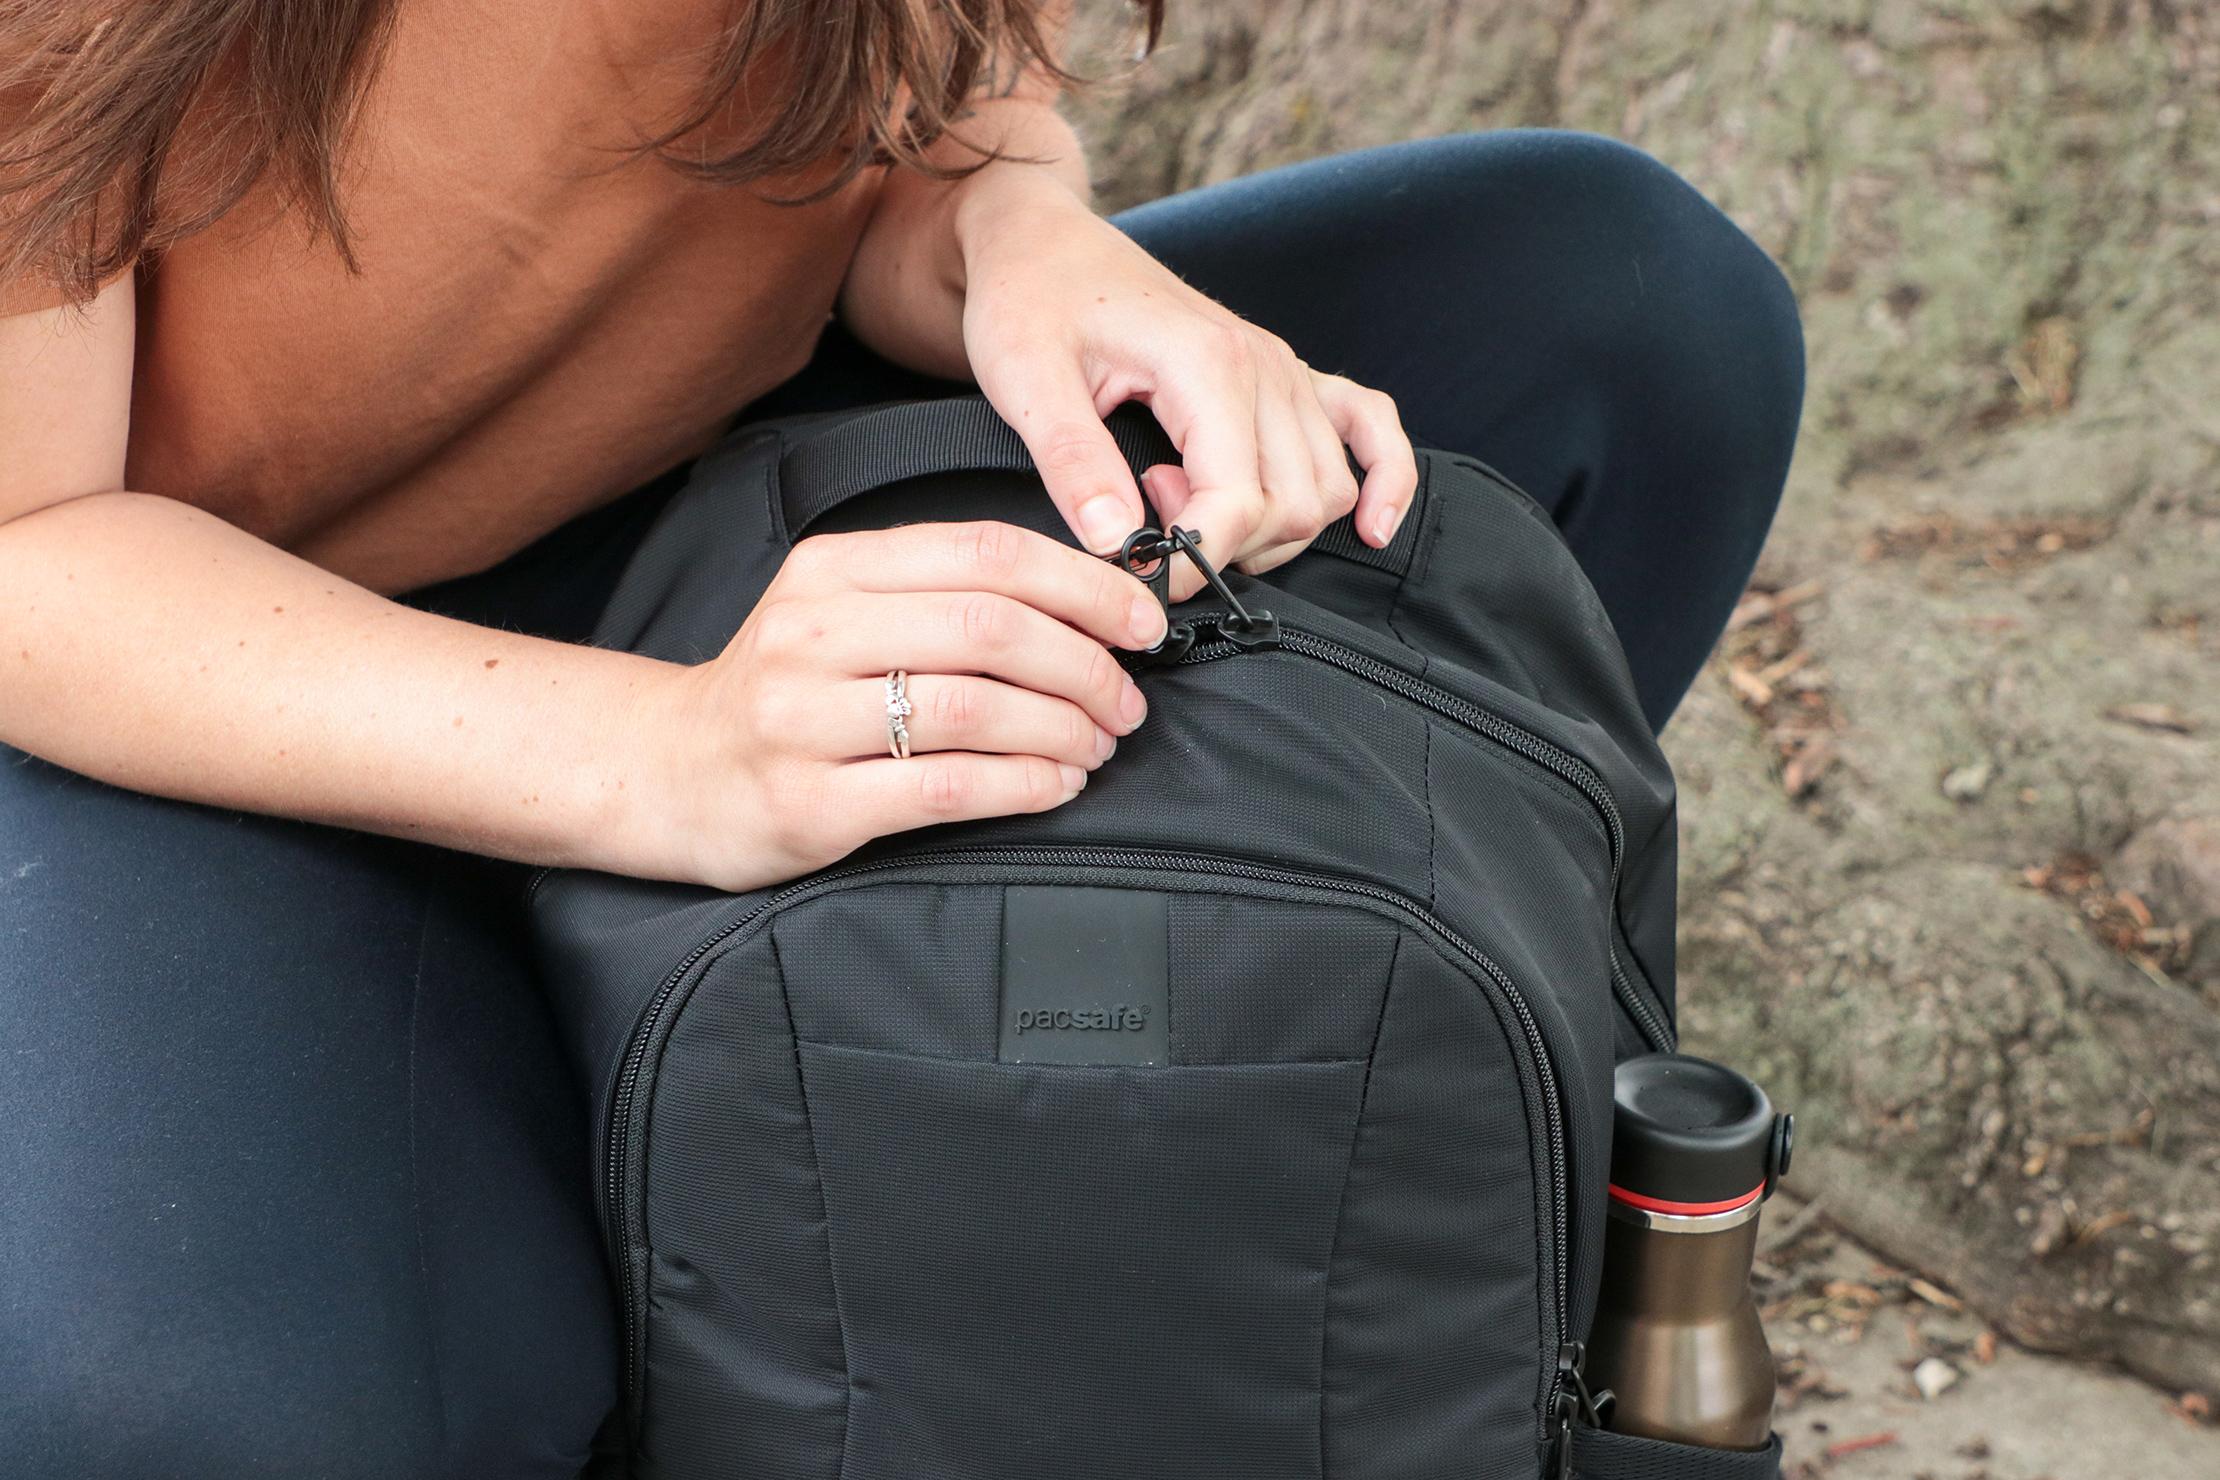 Pacsafe Metrosafe LS450 Anti-Theft Backpack Usage 2